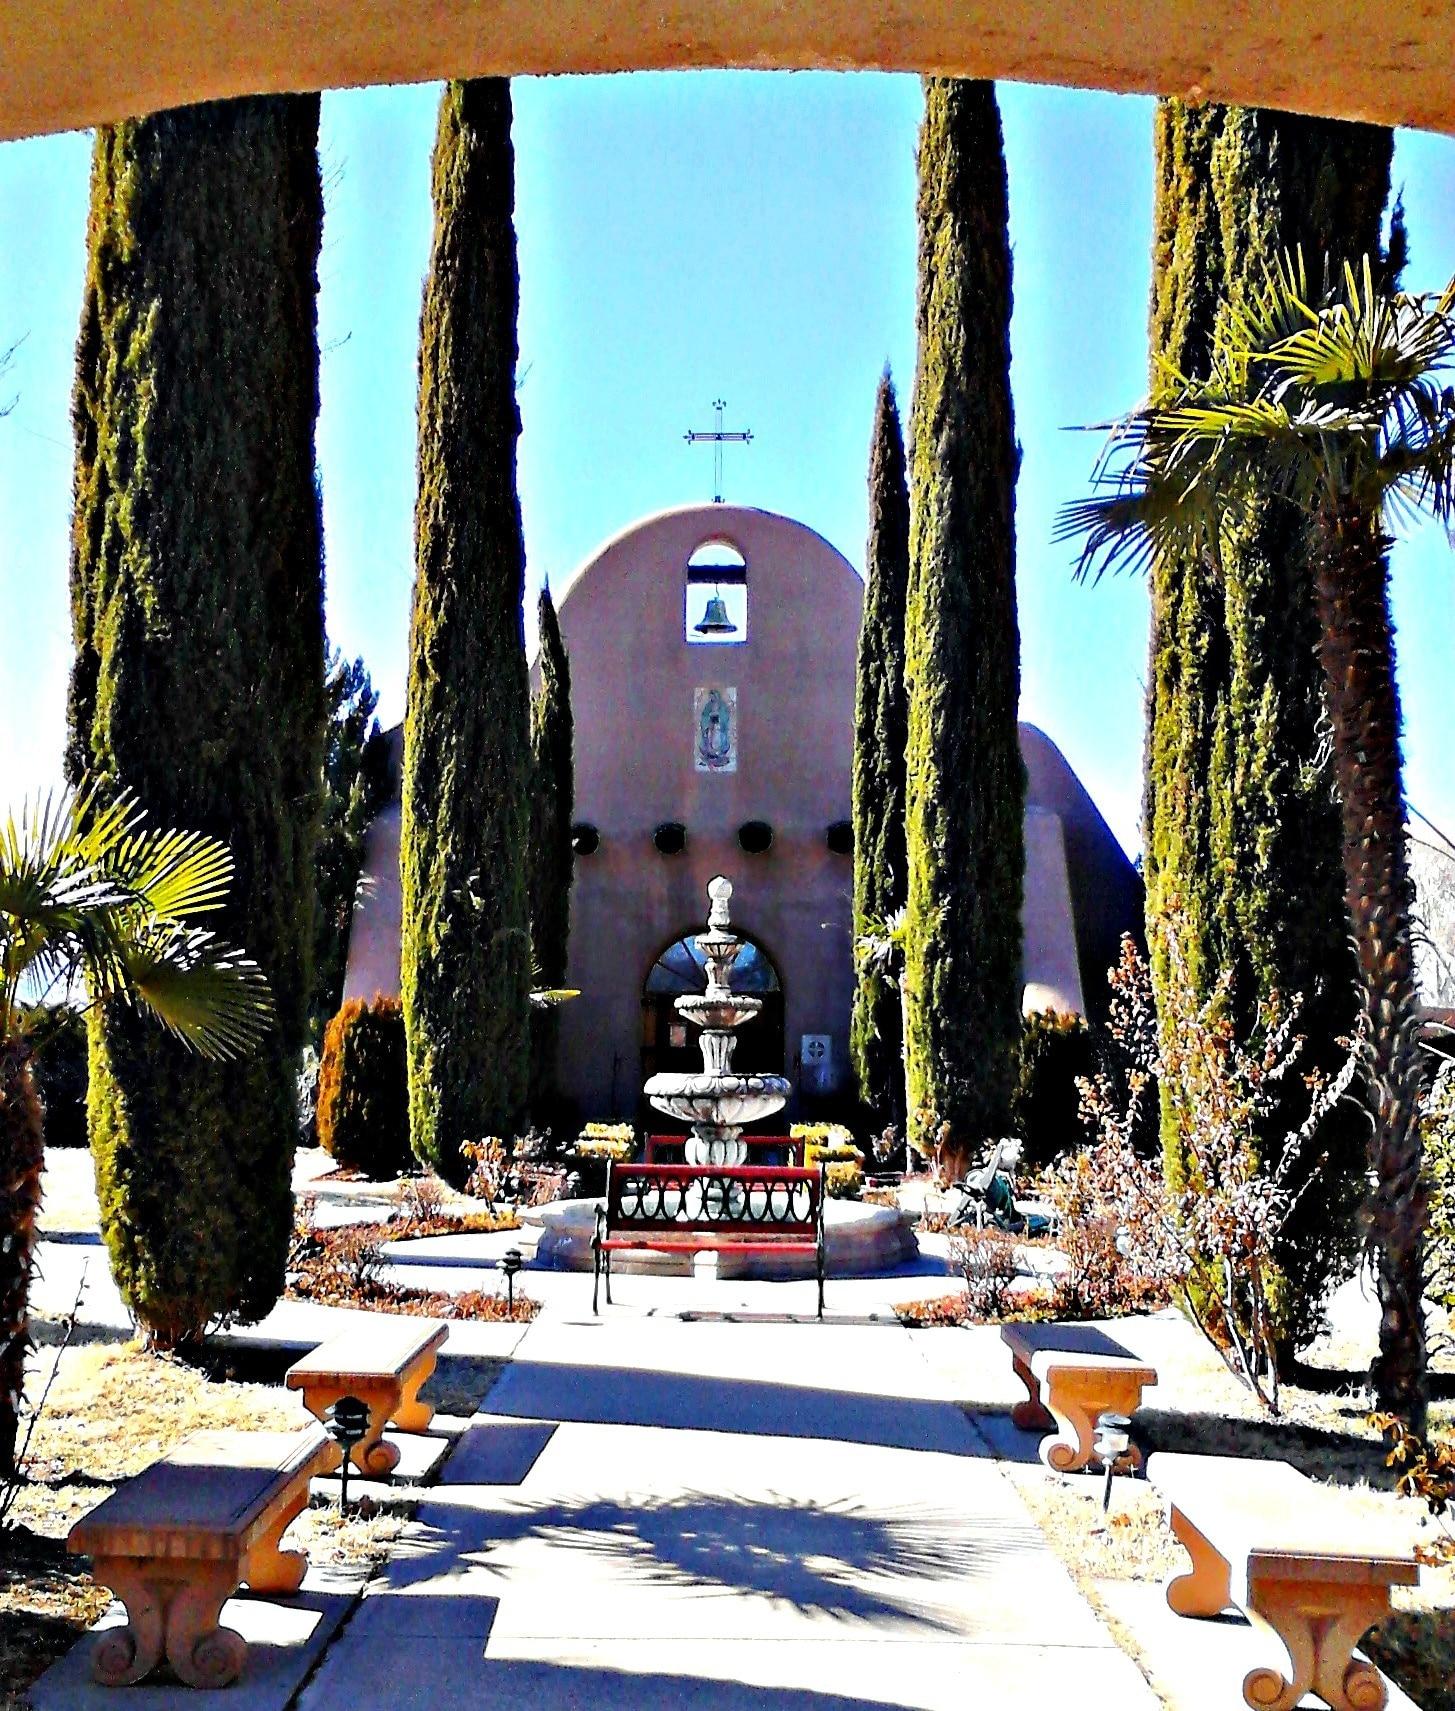 Saint David, Arizona, United States of America